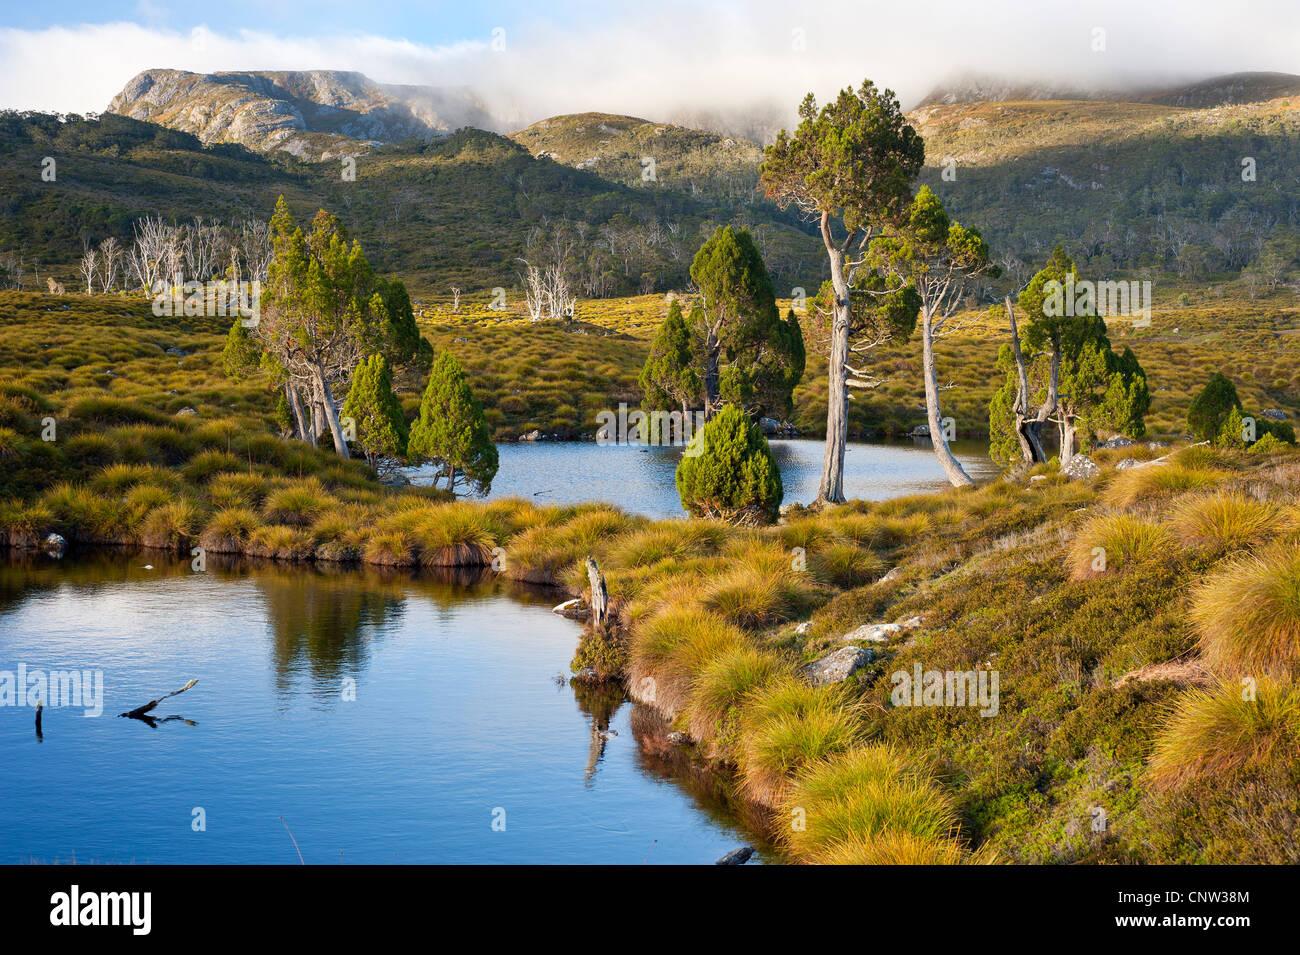 Mountain tarns ringed with Pencil pines in Cradle Mountain - Lake St Clair National Park Tasmania Australia - Stock Image